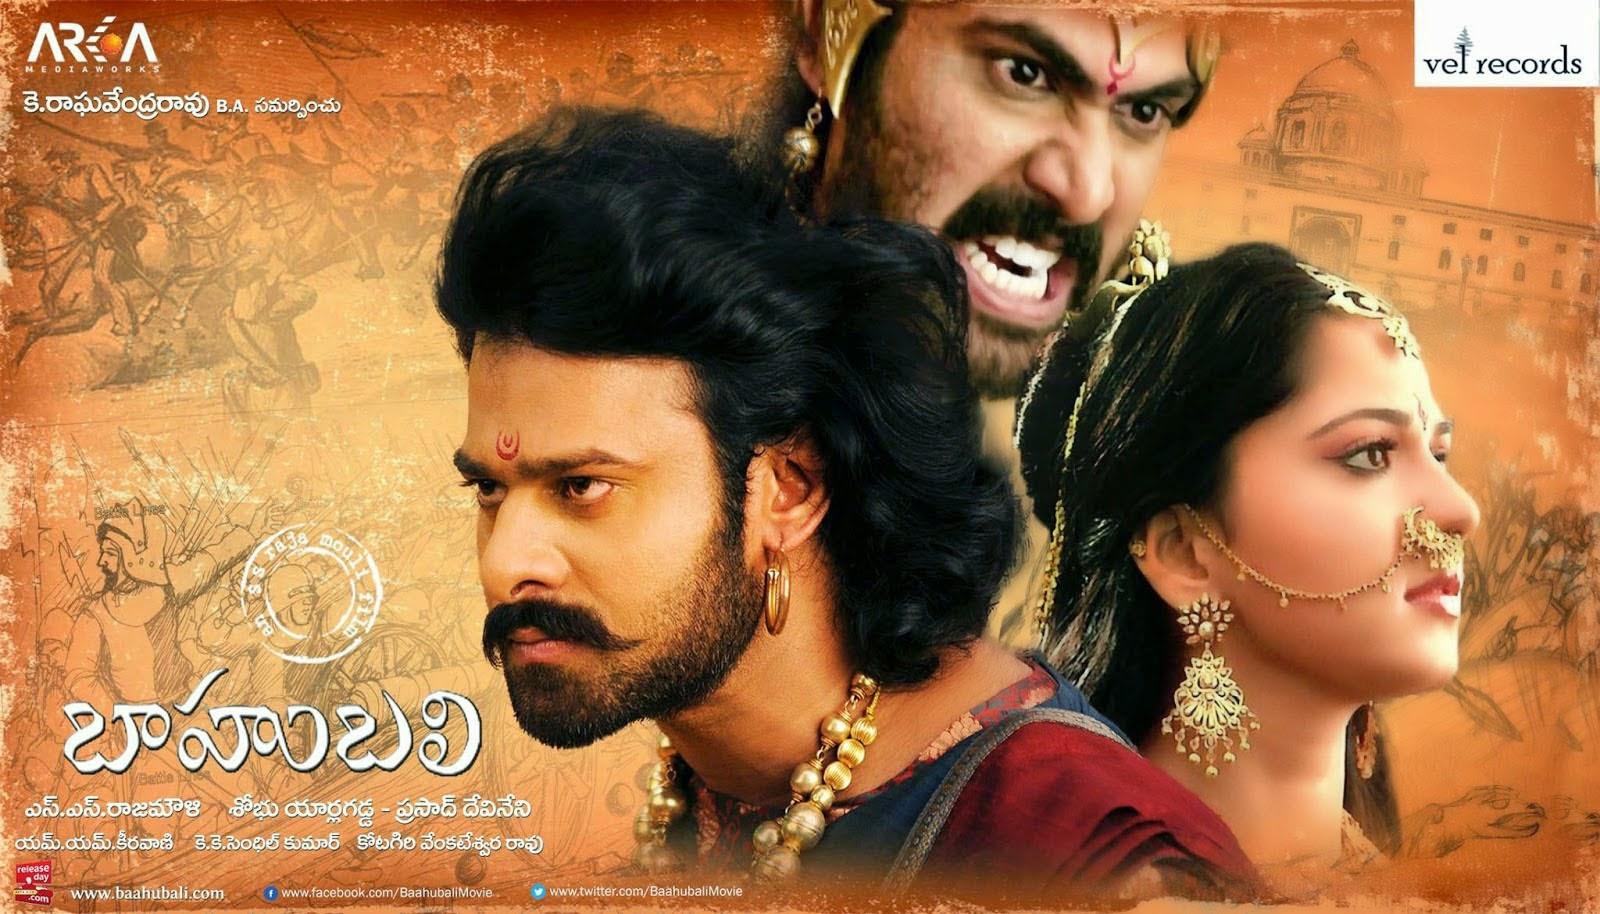 Bahubali actor prabhas wallpapers in jpg format for free download.